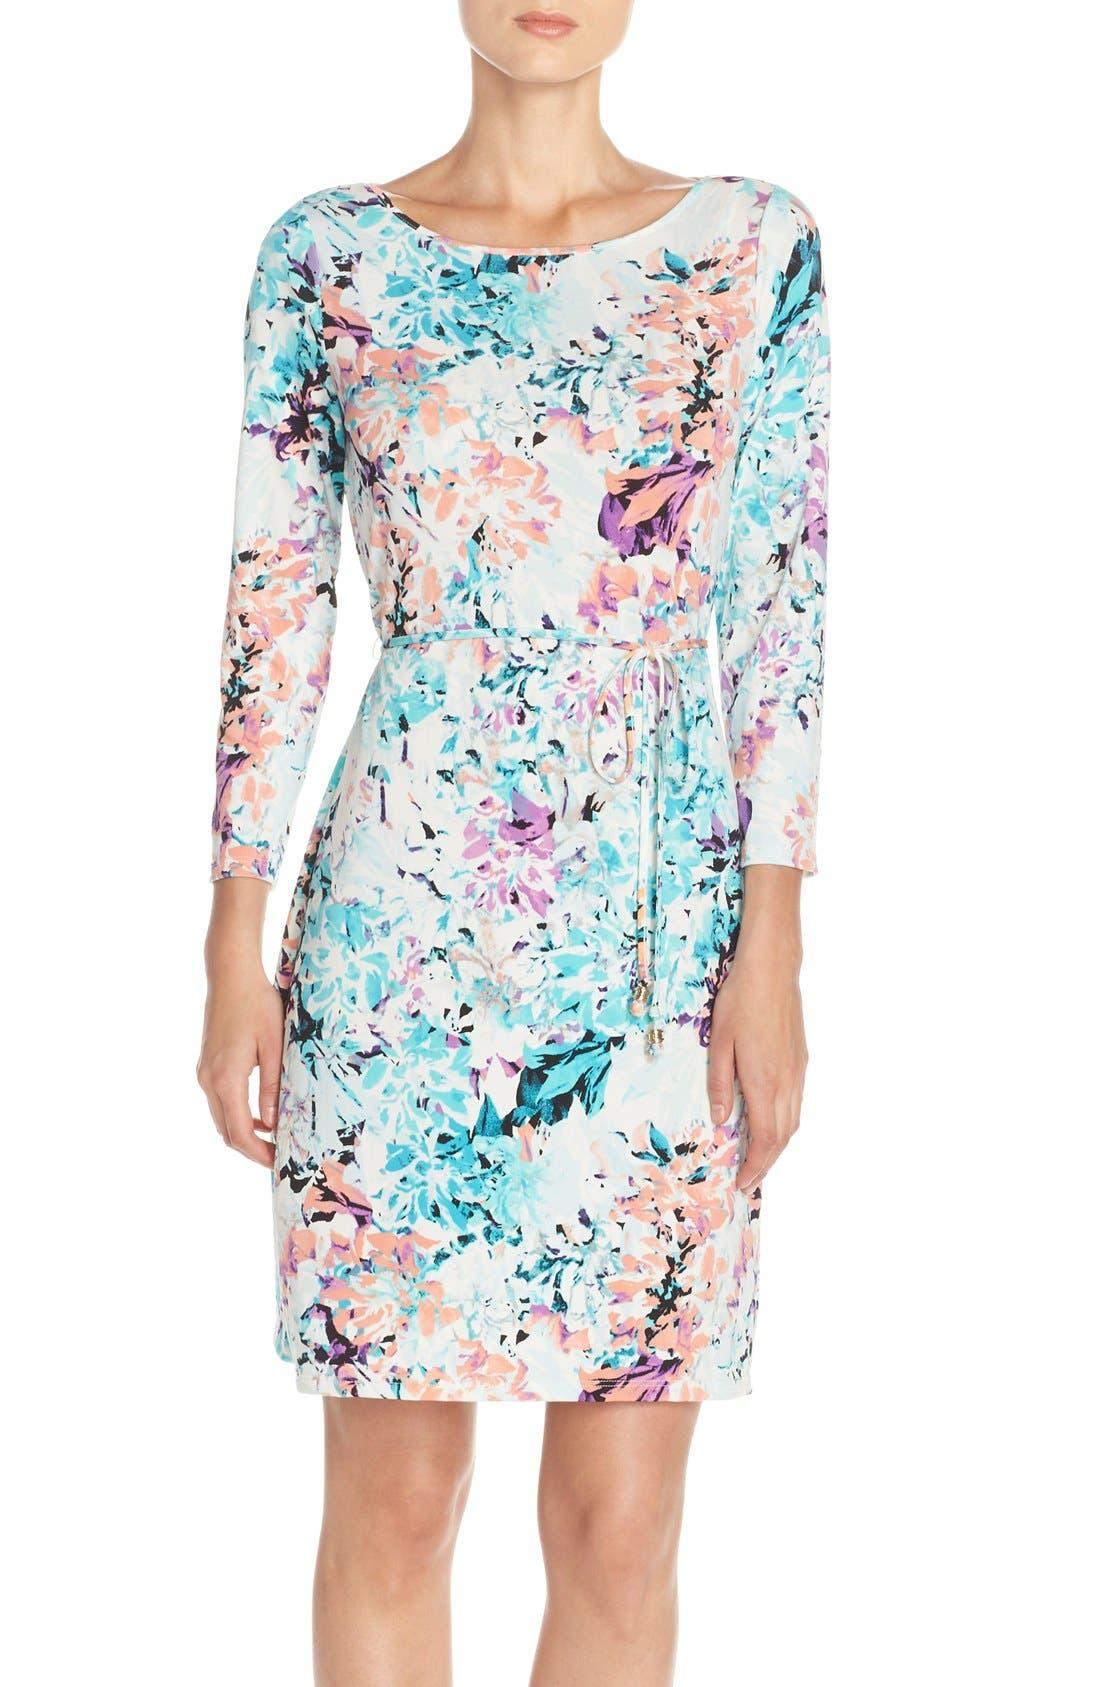 IVANKA TRUMP Floral Print Jersey A-Line Dress, Main, color, 101